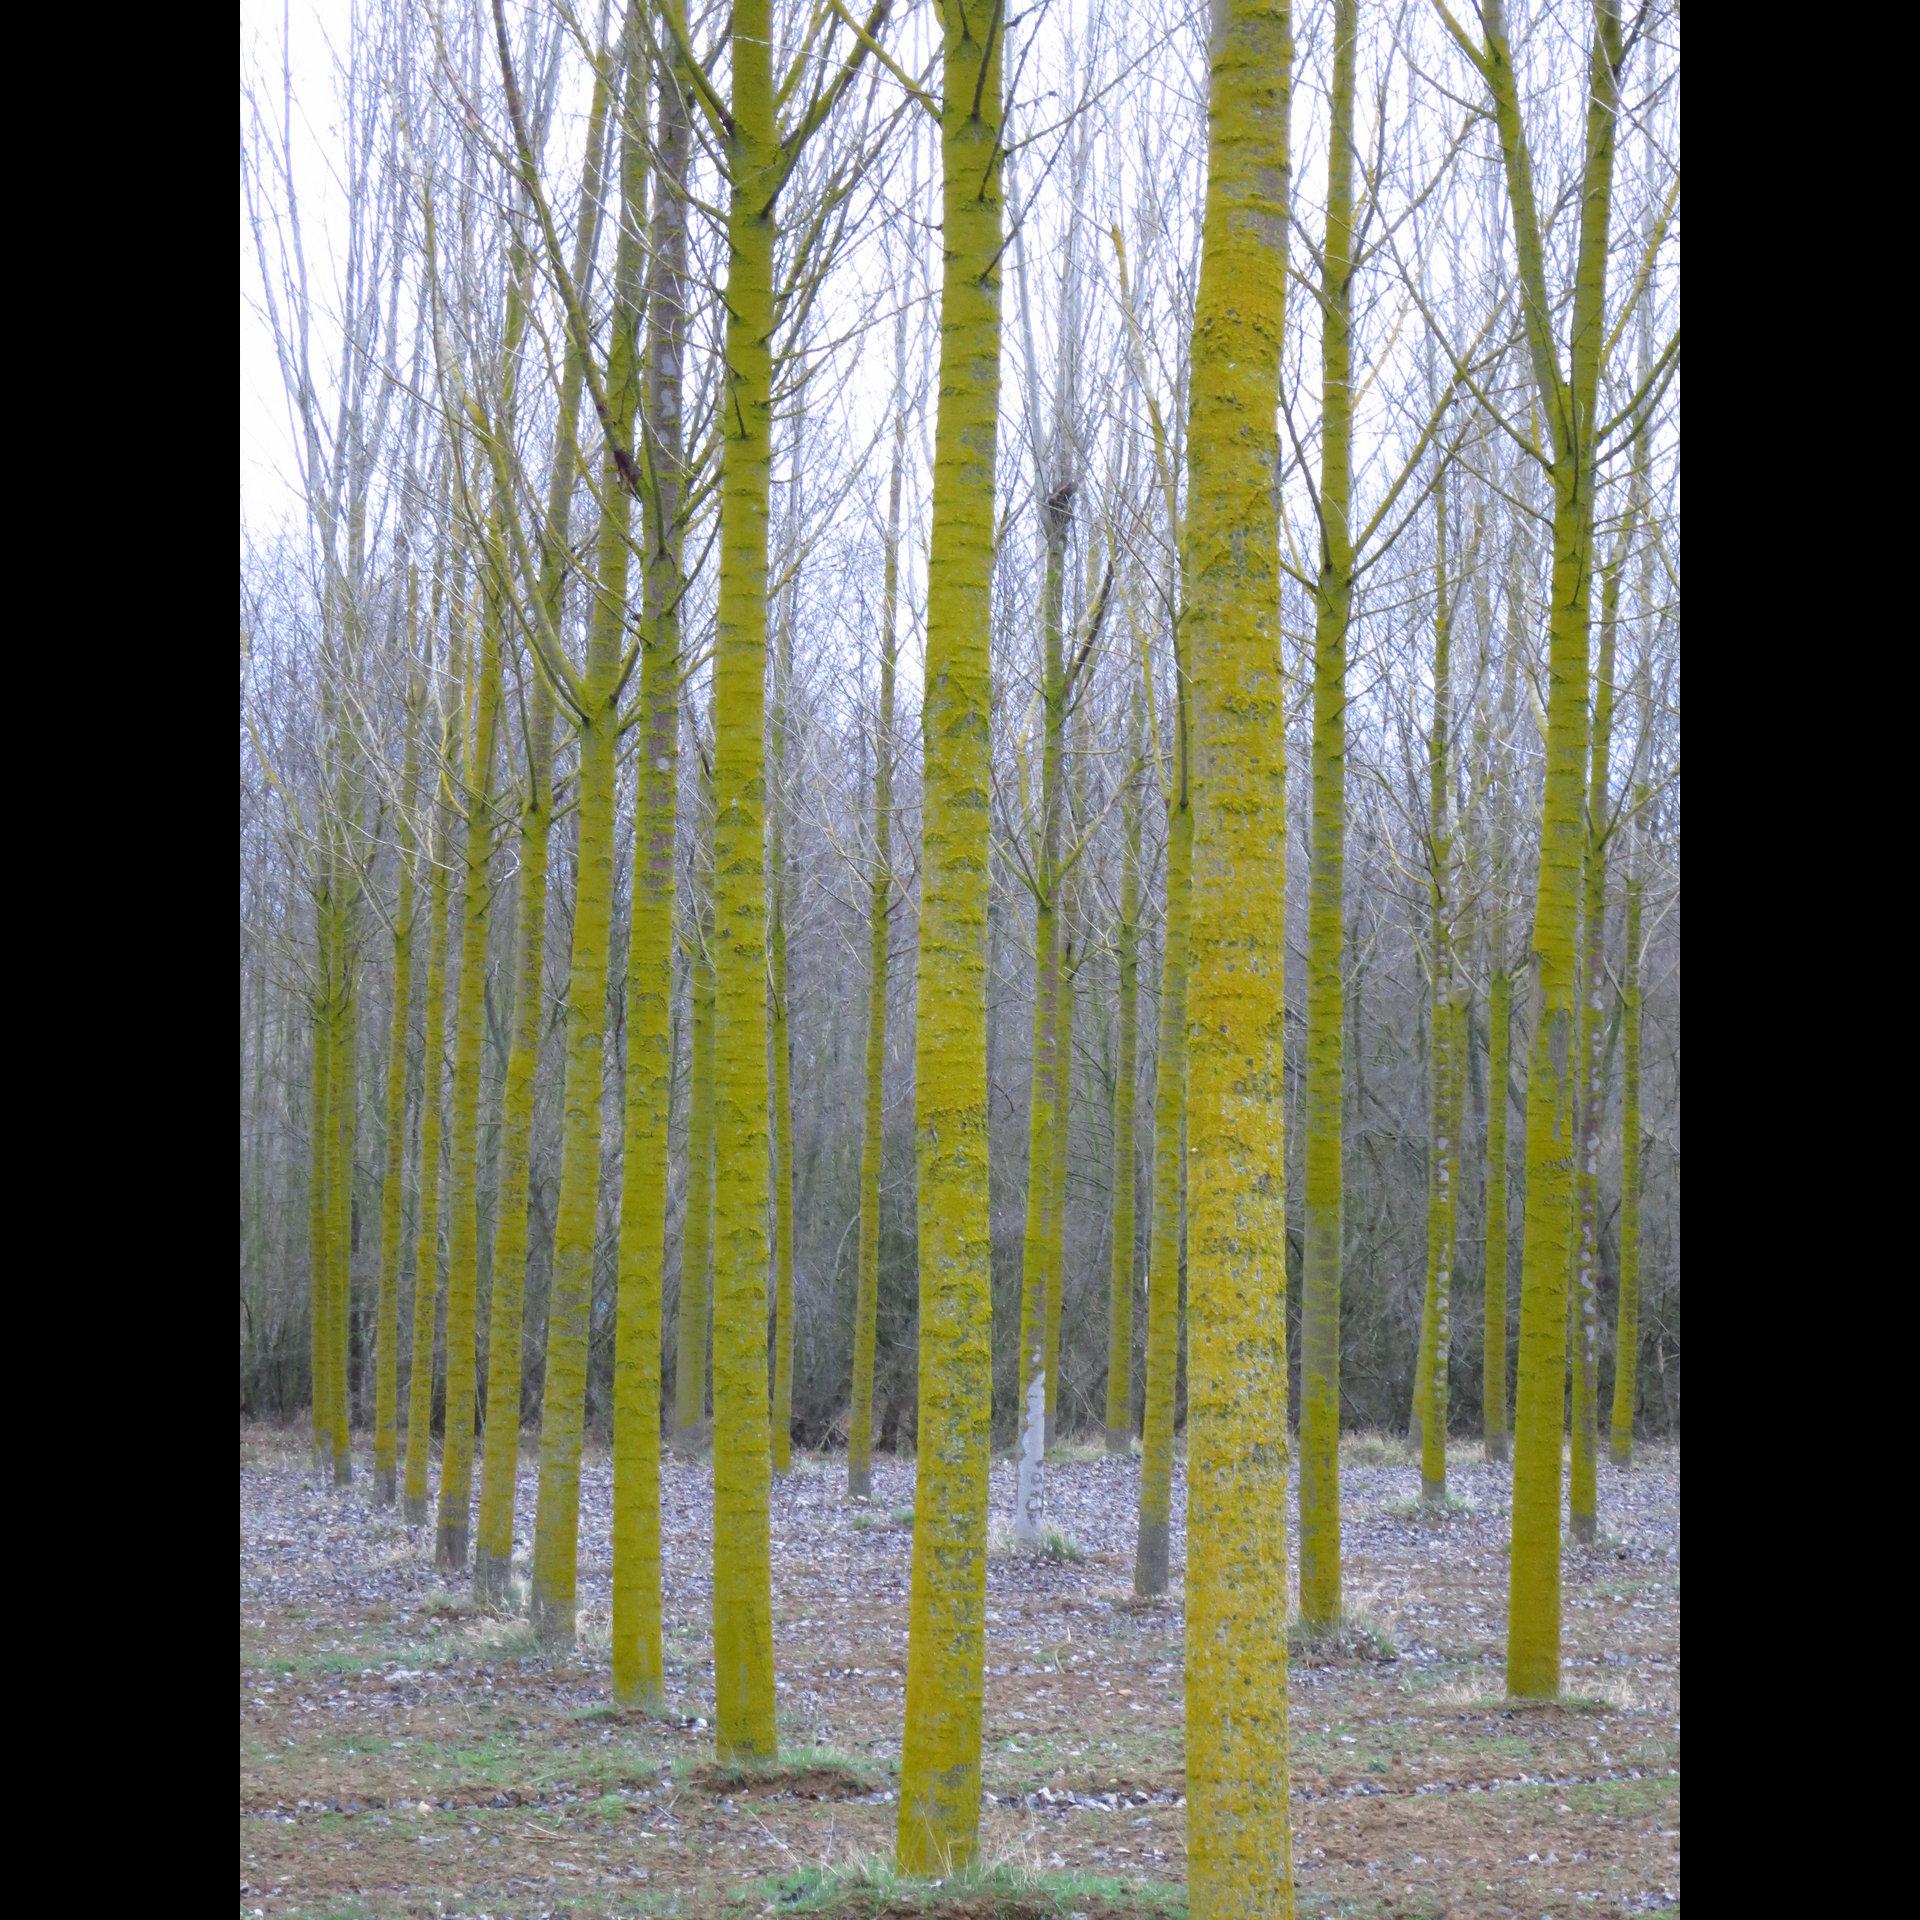 Grove of Trees #2, Spain